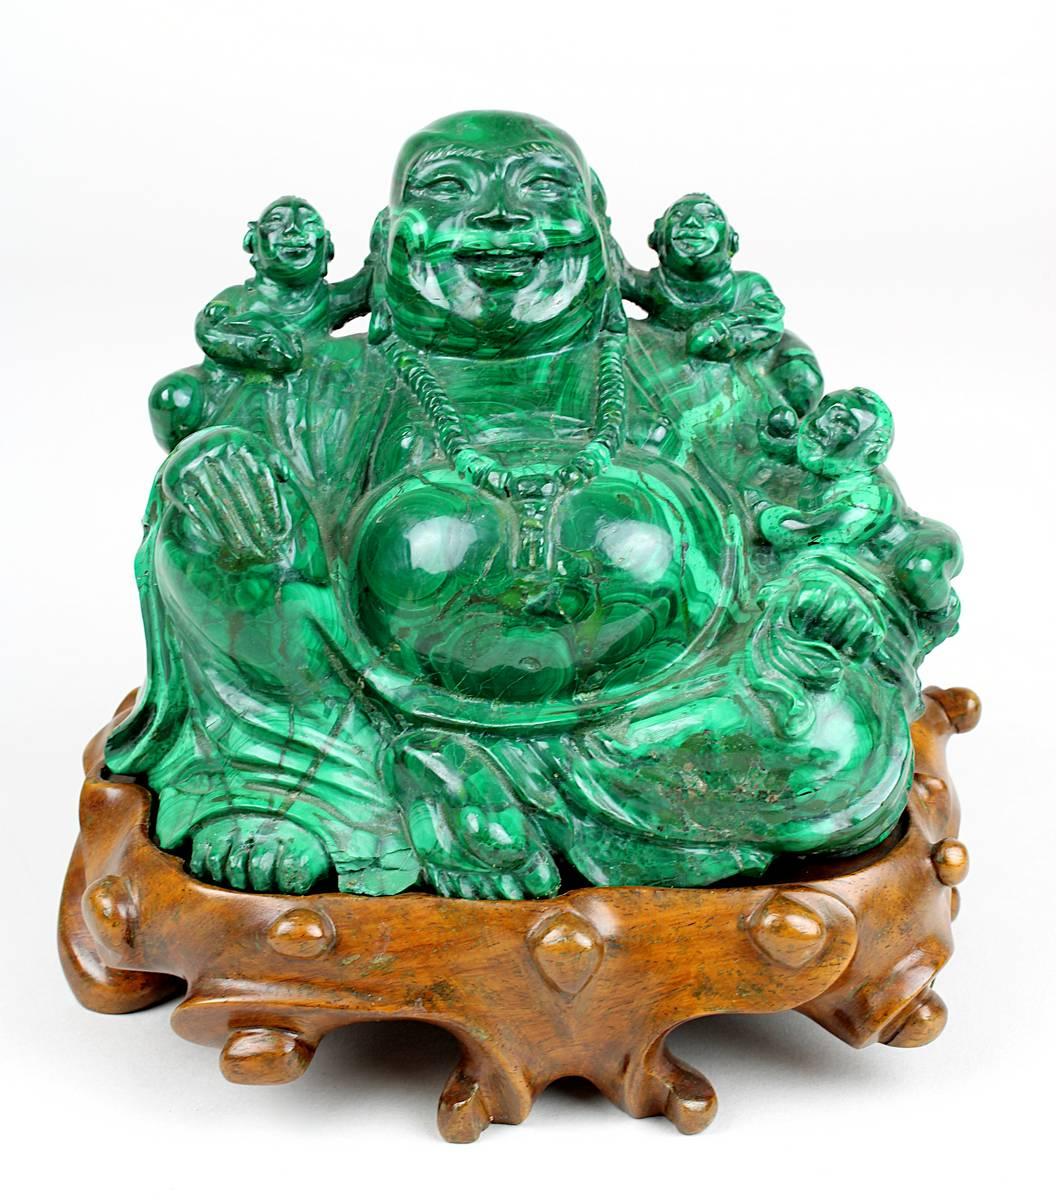 1-0031 - Malachit-Glücksbuddha-Figur, China um 1950 Image